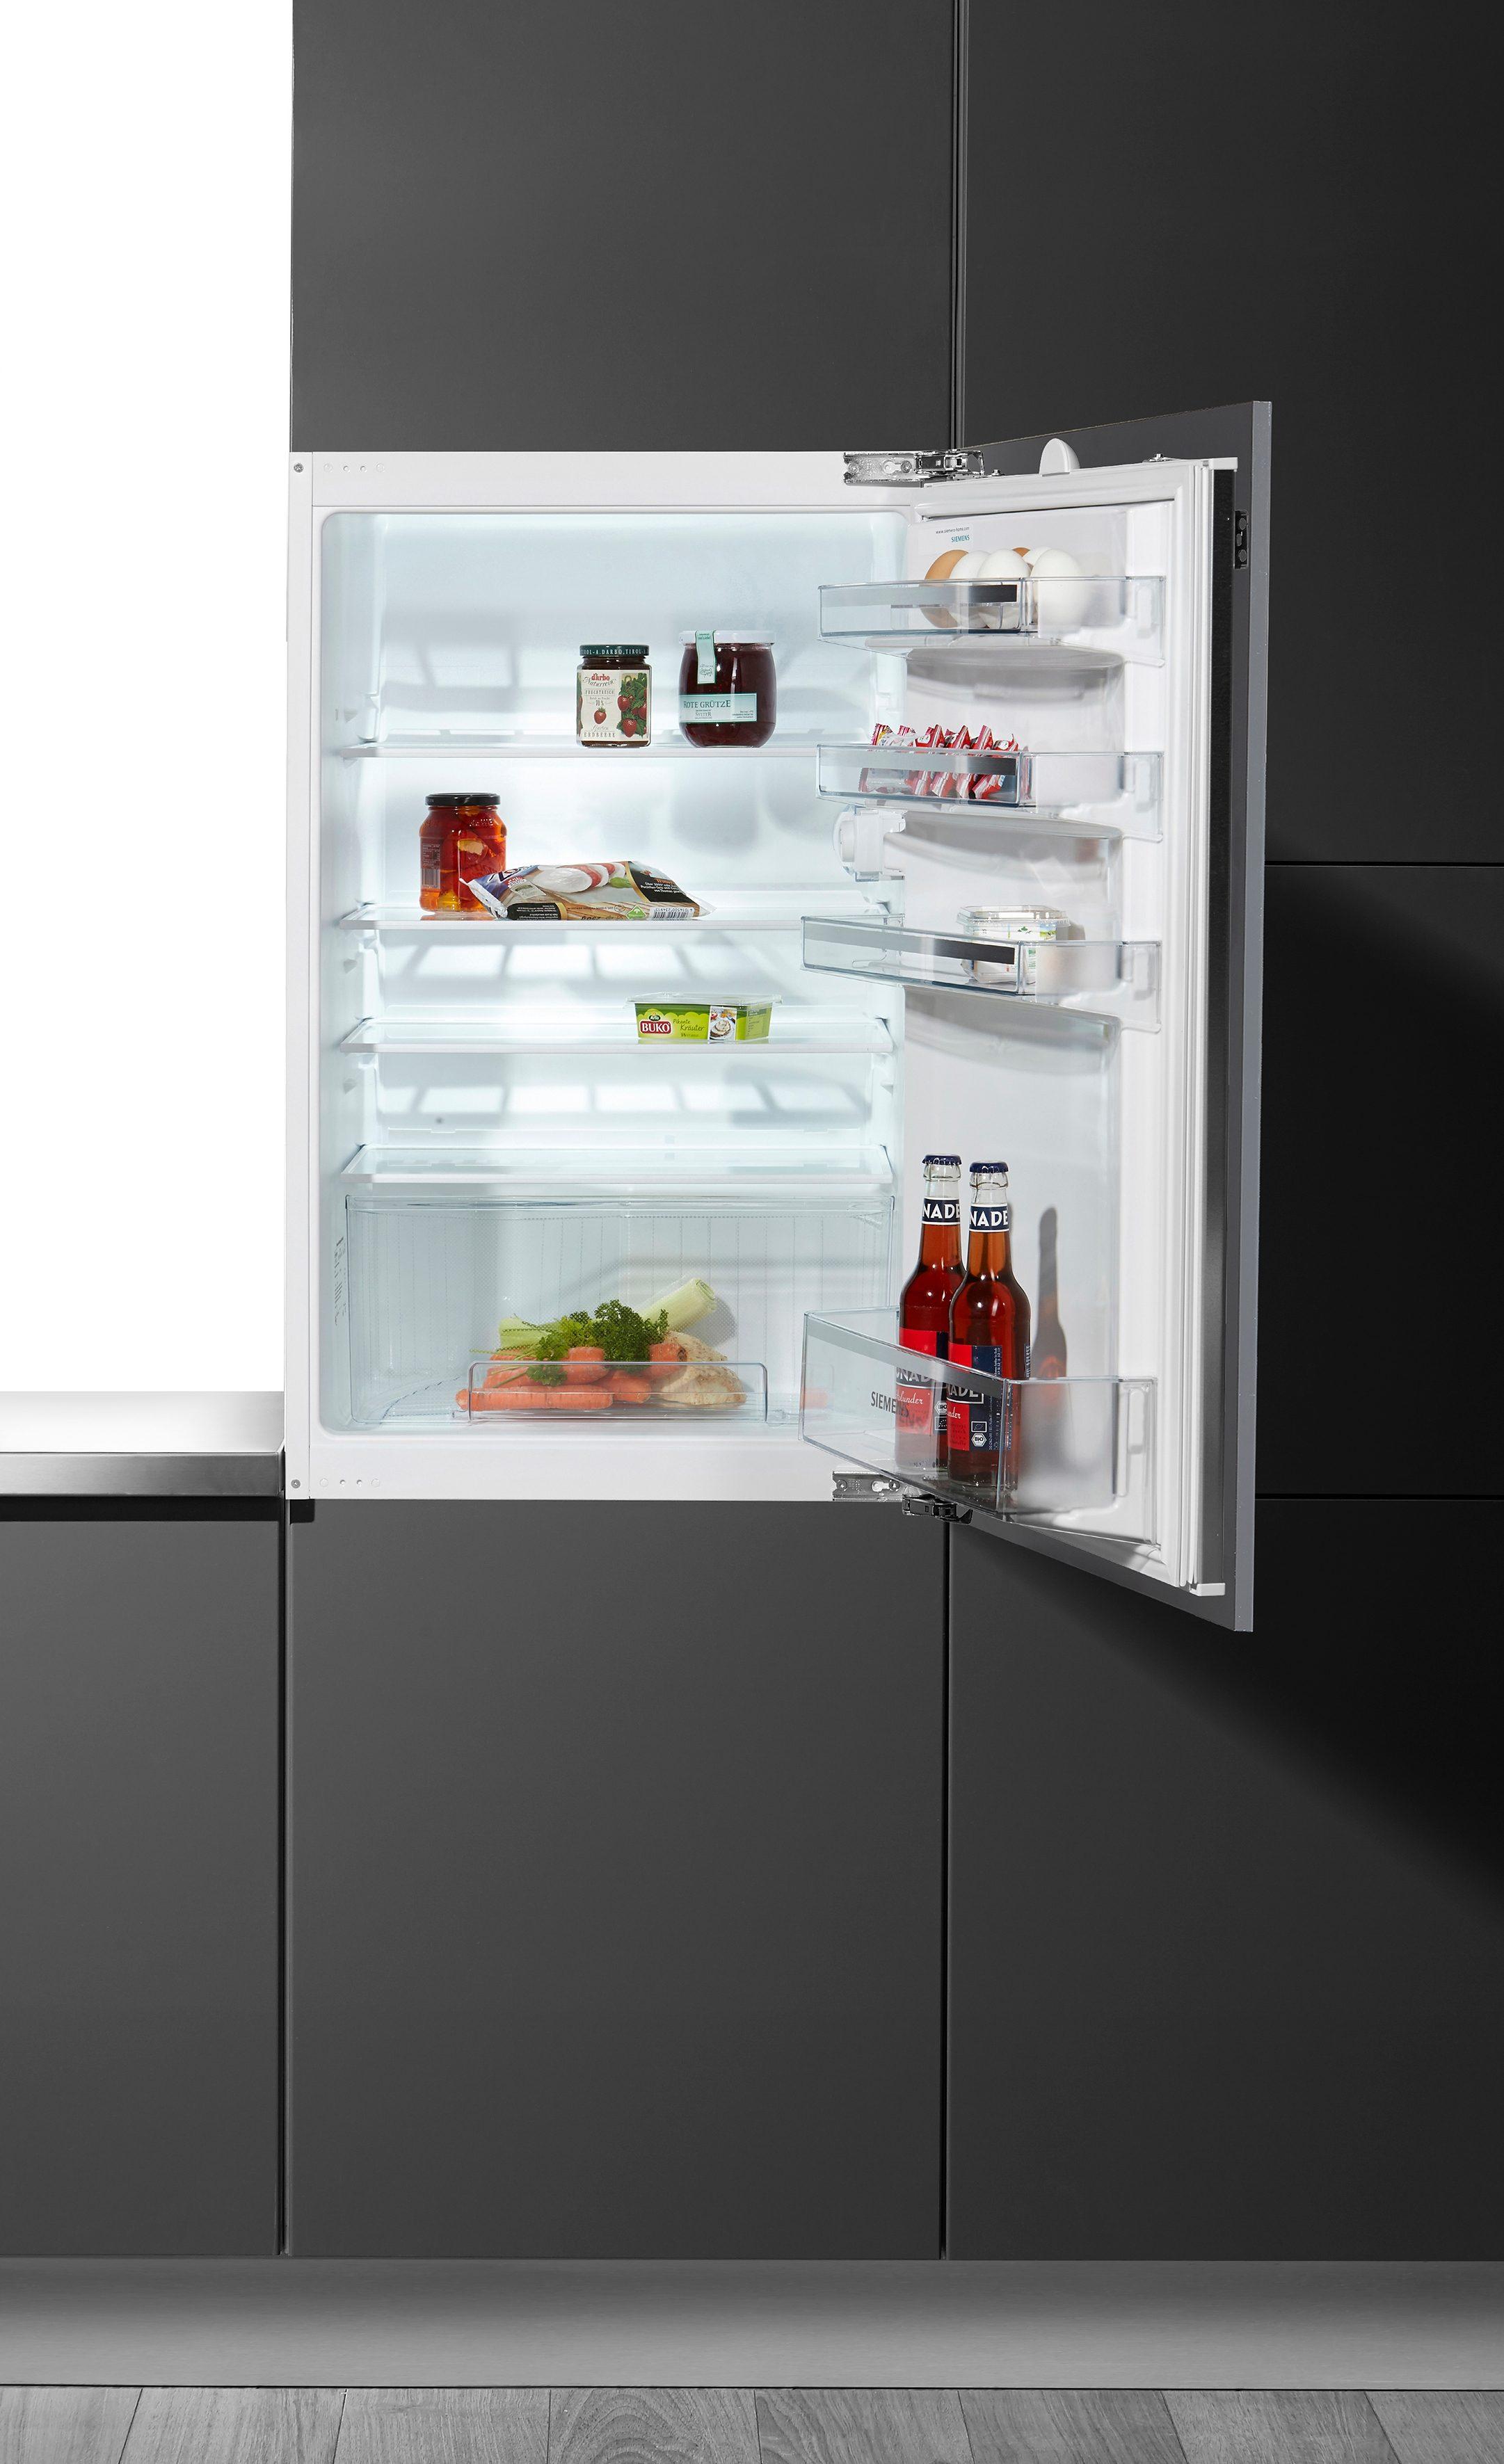 Siemens integrierbarer Einbaukühlschrank »KI18RV51«, A+, 88 cm